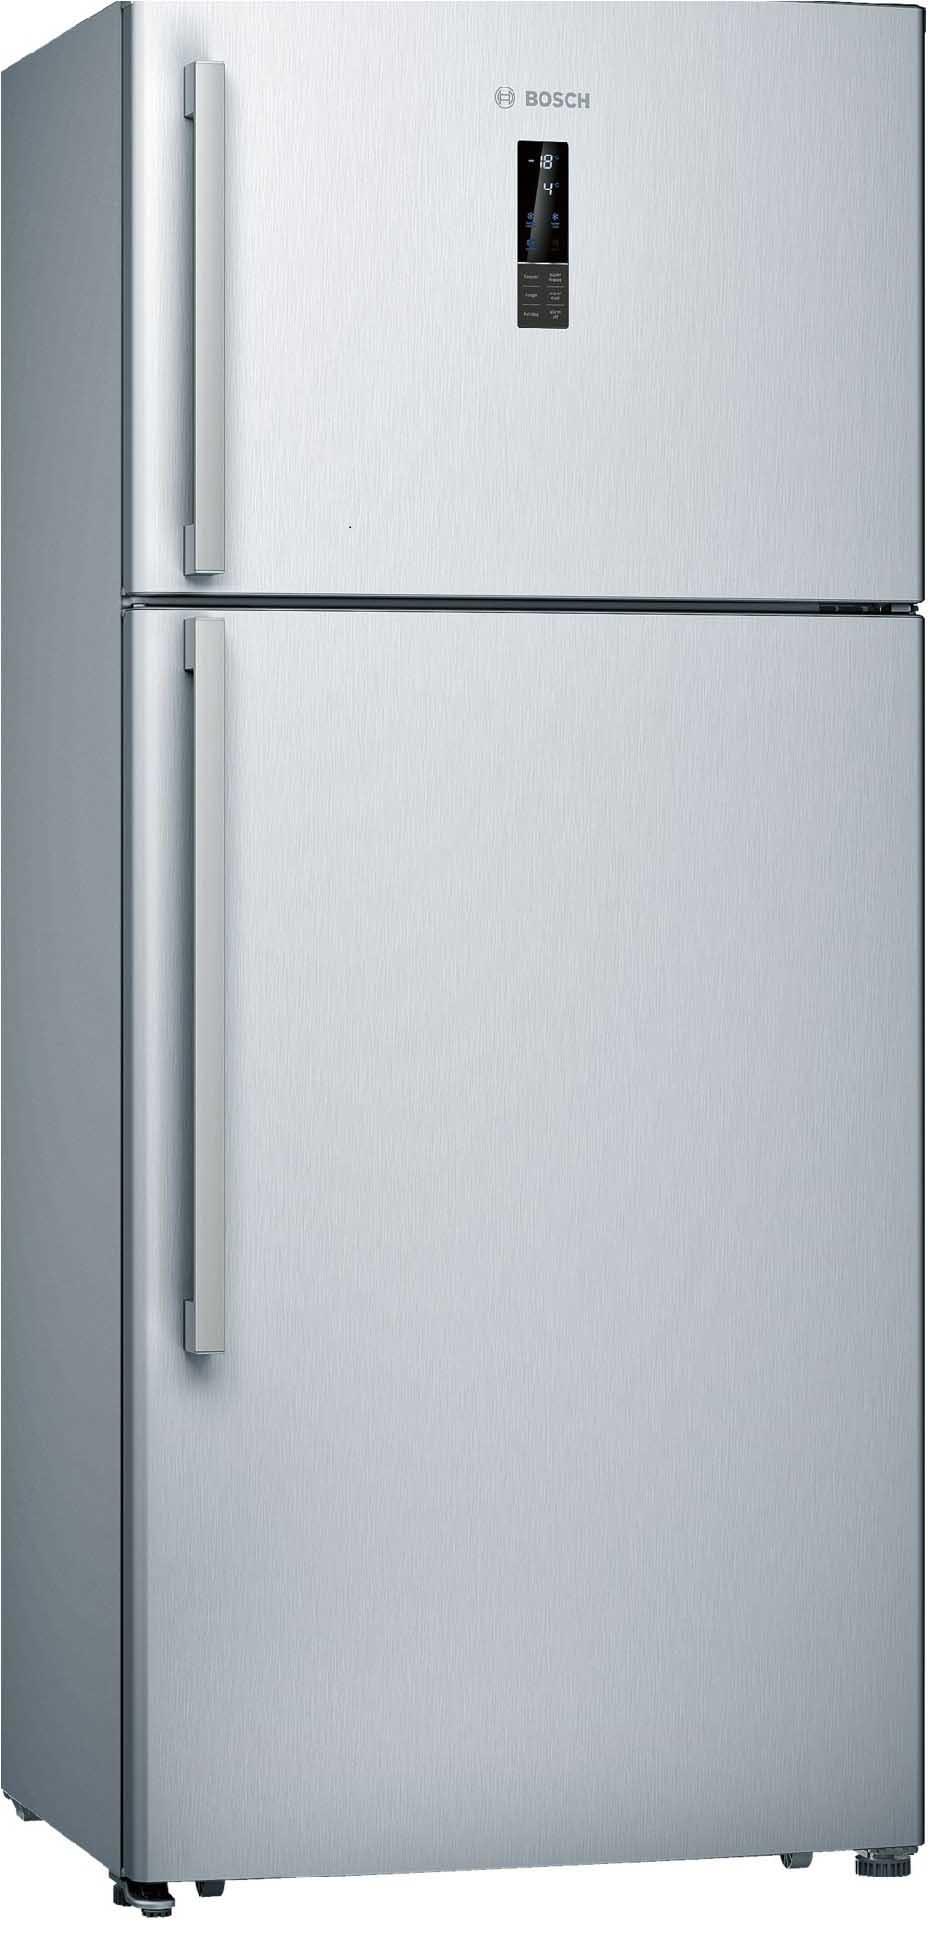 Bosch Top Mount Refrigerator 526 Litres (KDN65VI20M)